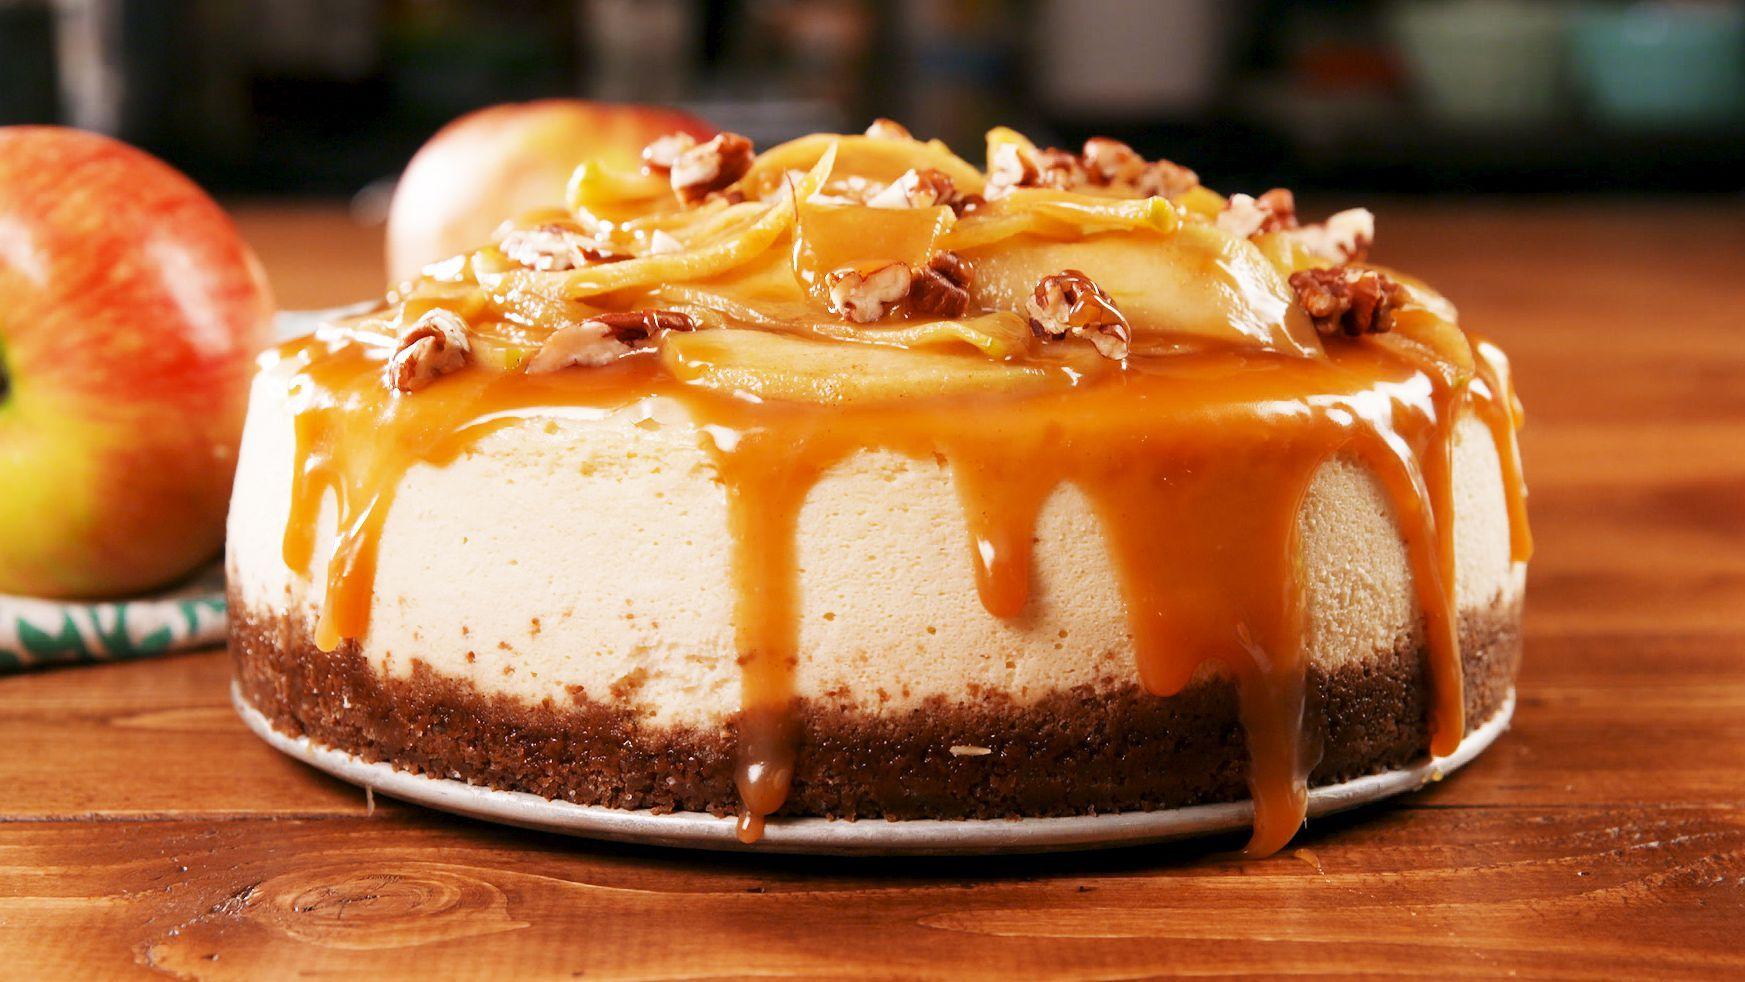 Caramel Apple Cheesecake = Fall Goals #caramelapplecheesecake